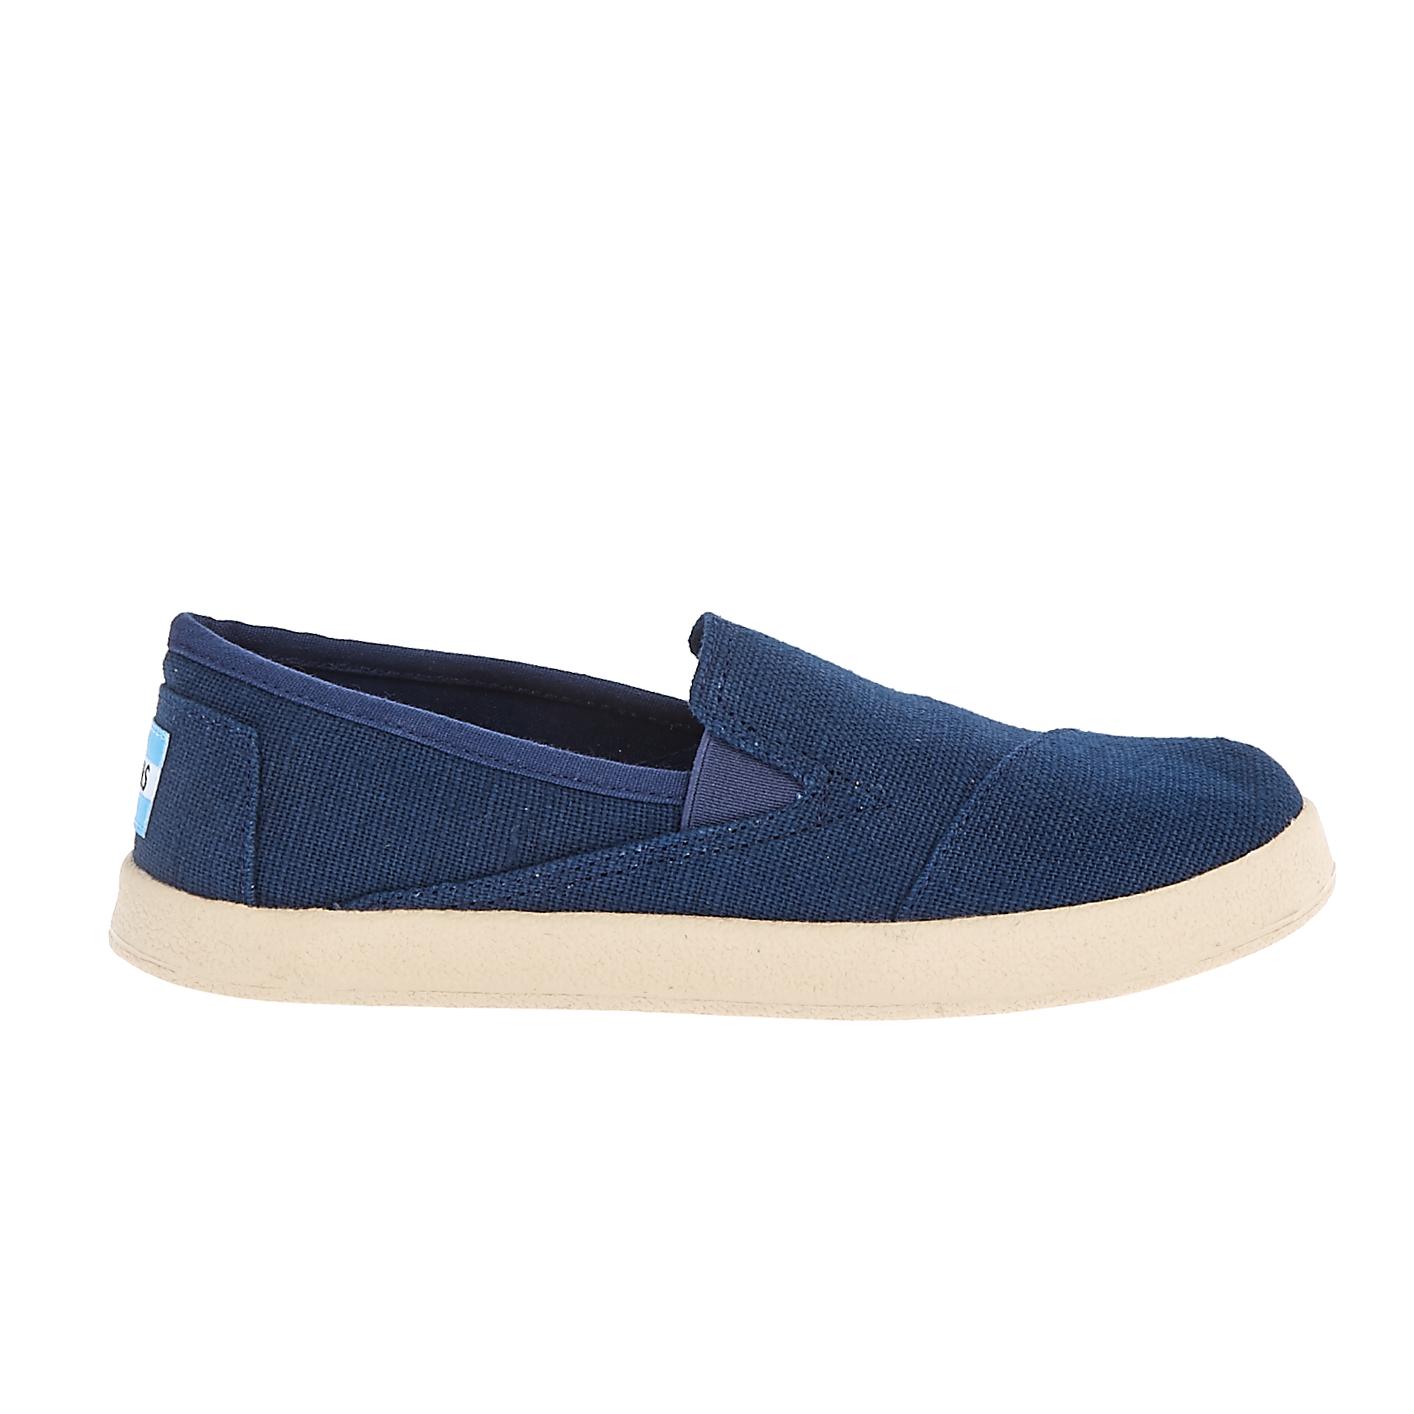 TOMS - Παιδικά slip on παπούτσια TOMS μπλε παιδικά boys παπούτσια casual